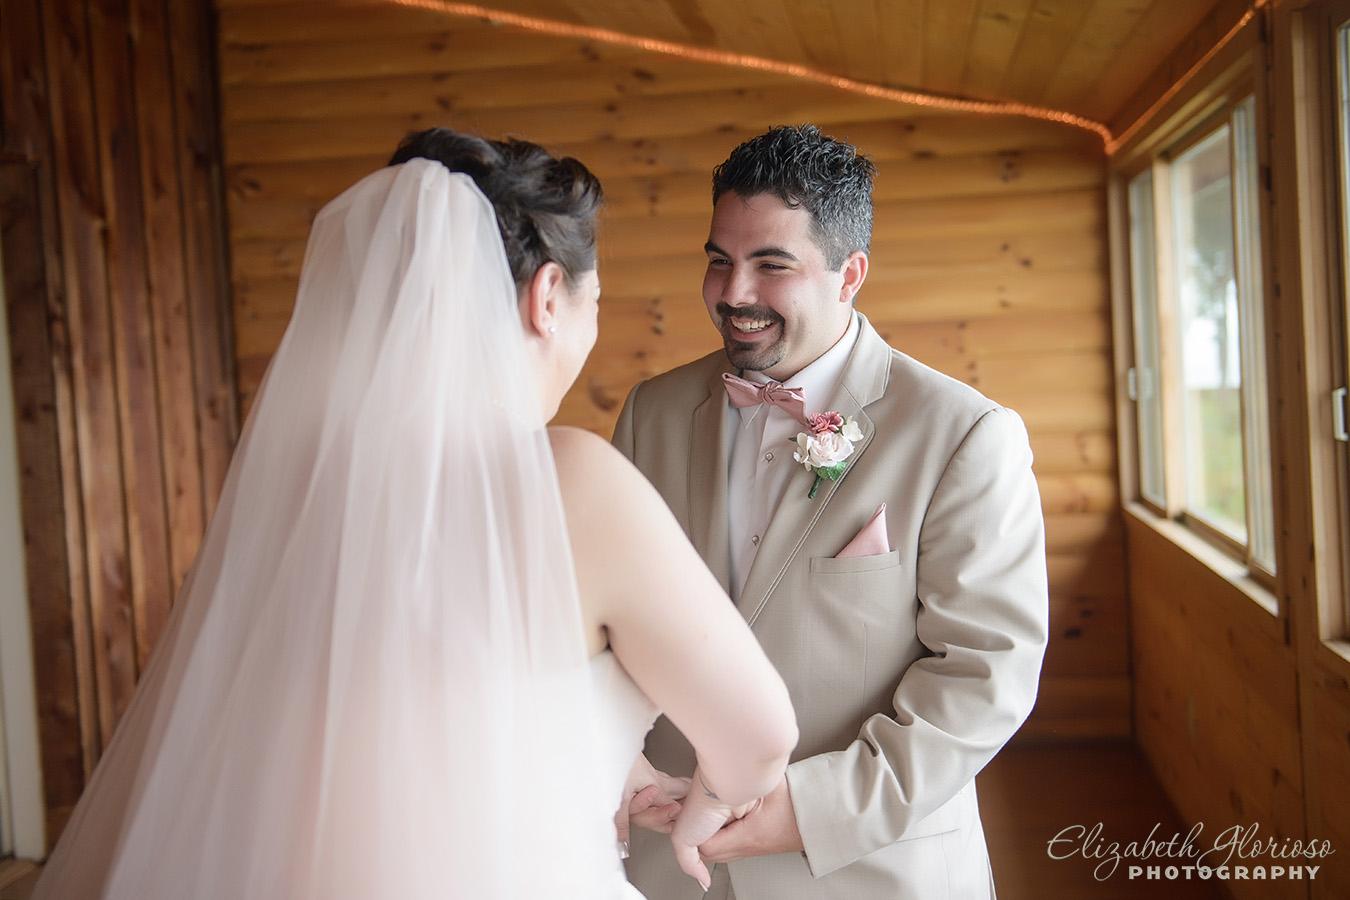 Vermilion_wedding_Glorioso Photography_1022